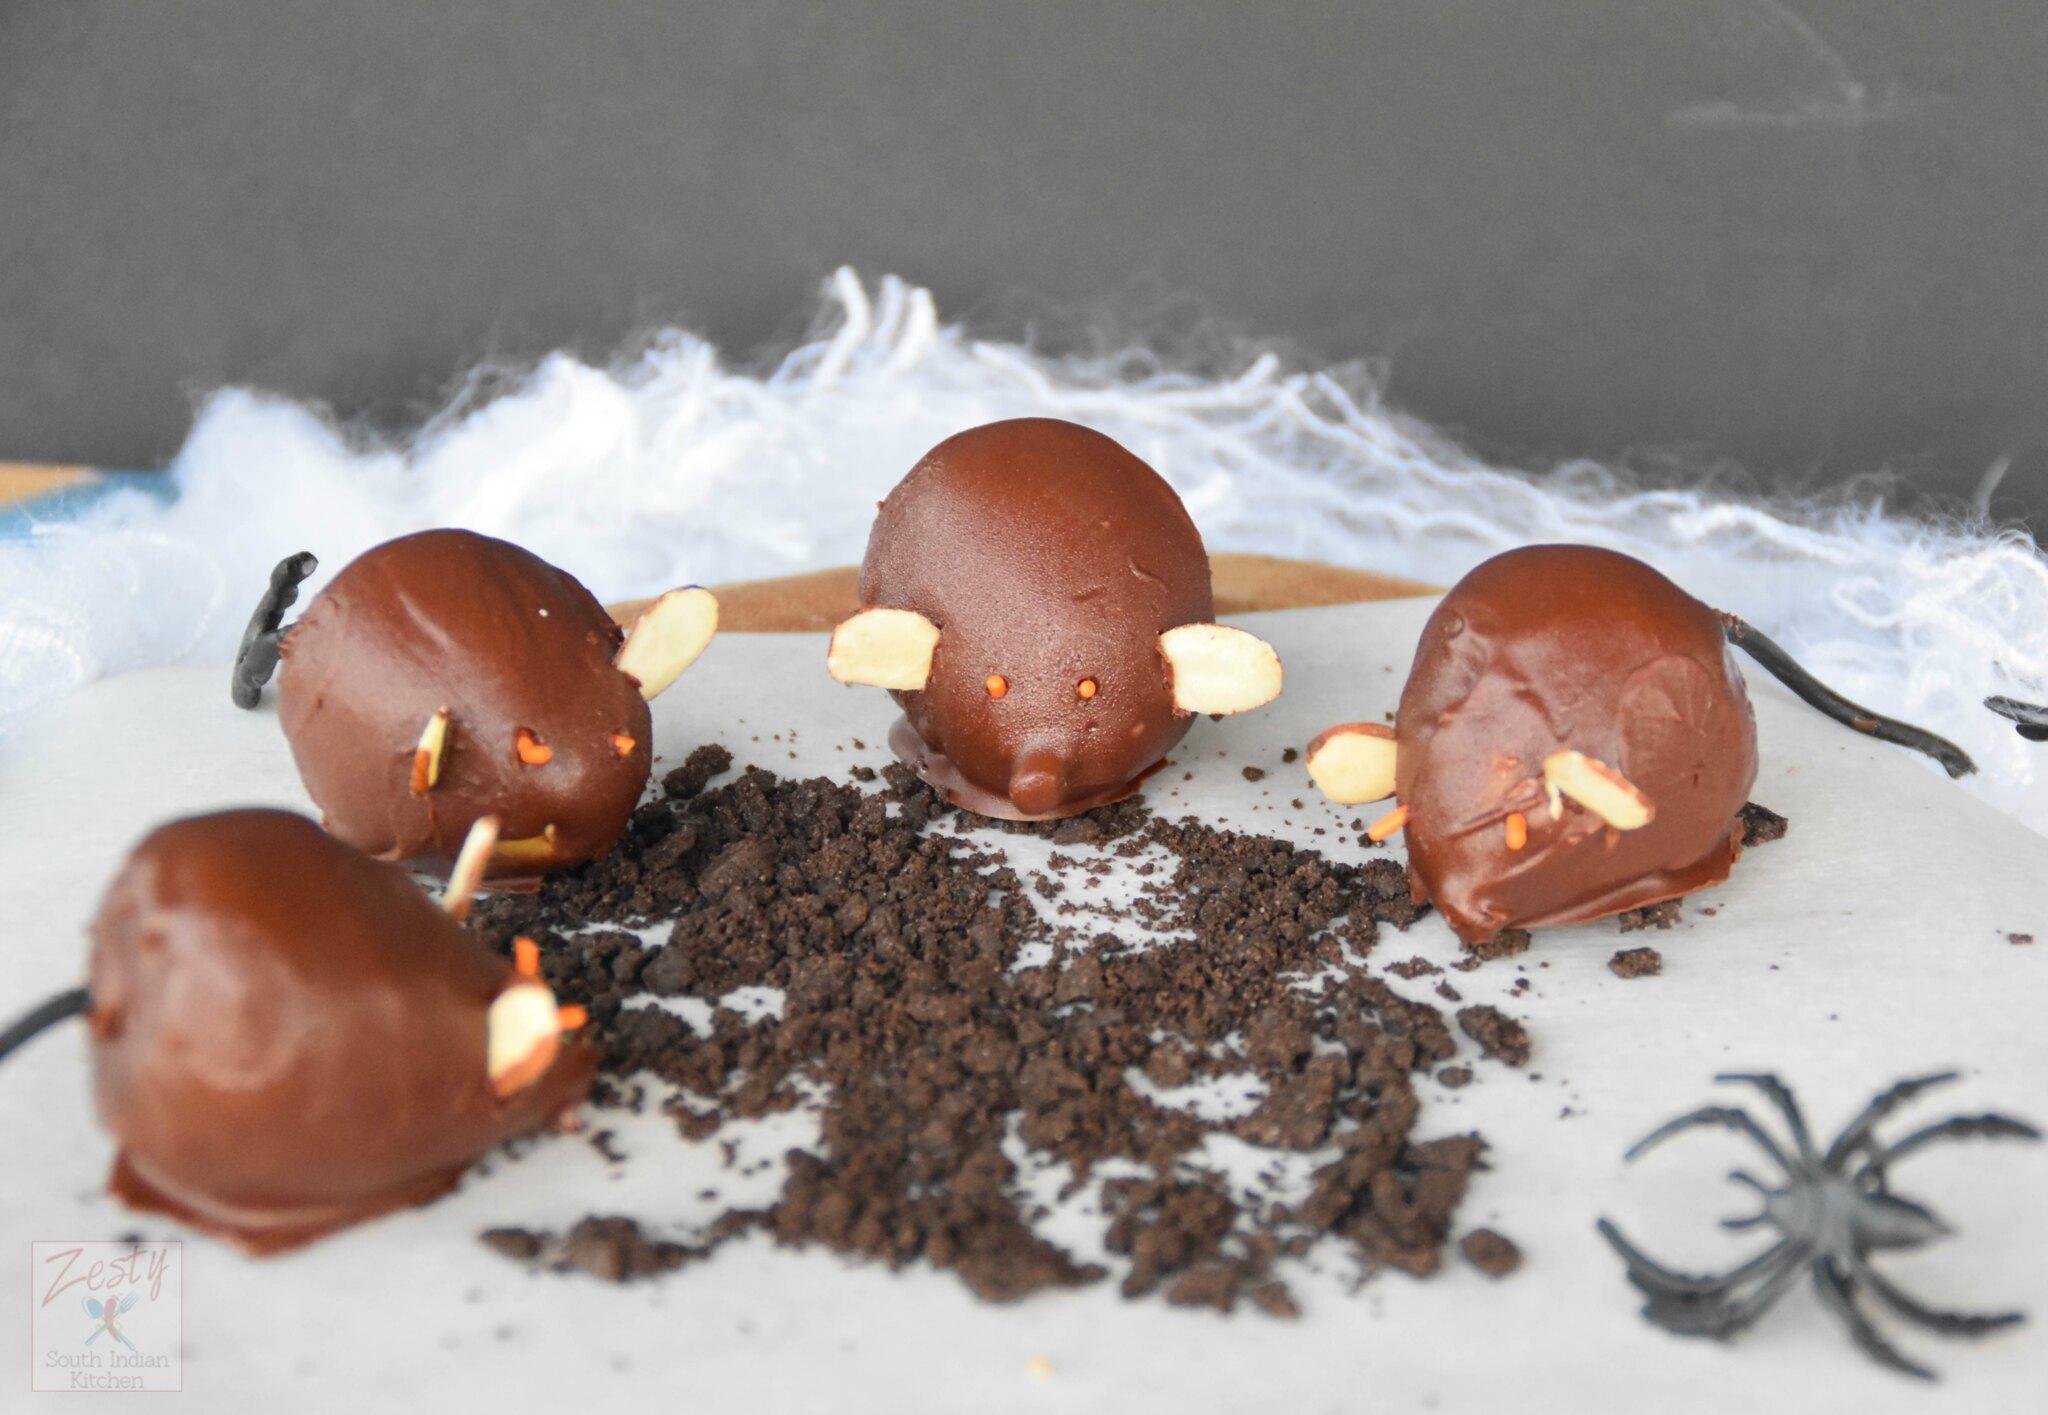 "<img src=""https://cdn.shortpixel.ai/client/q_glossy,ret_img,w_2048,h_1415/Chocolate fig mice.jpg"" alt="" Chocolate fig mice 2"">"